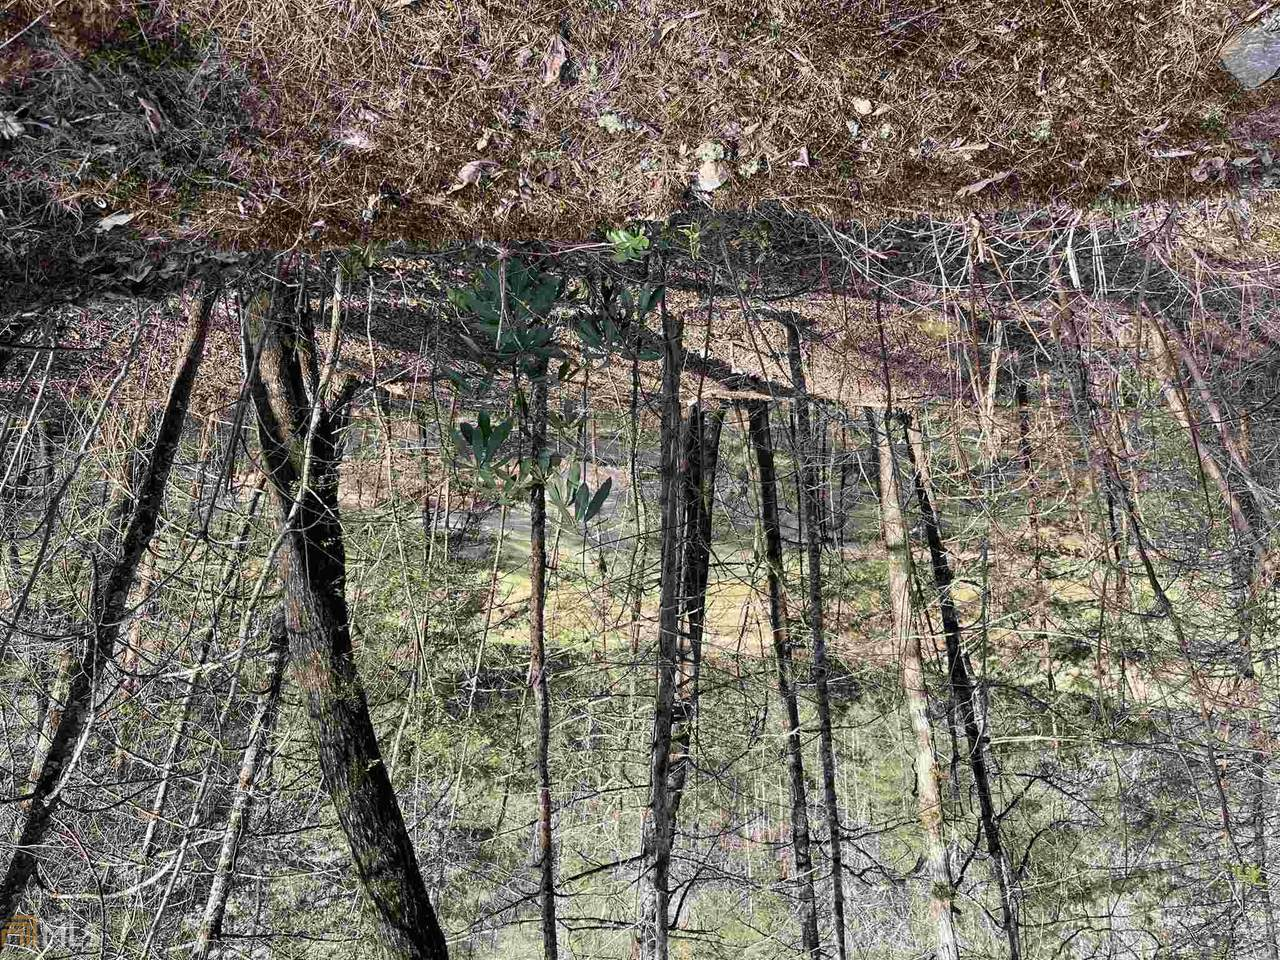 0 Dach Brucke Gasse 3 - Photo 1